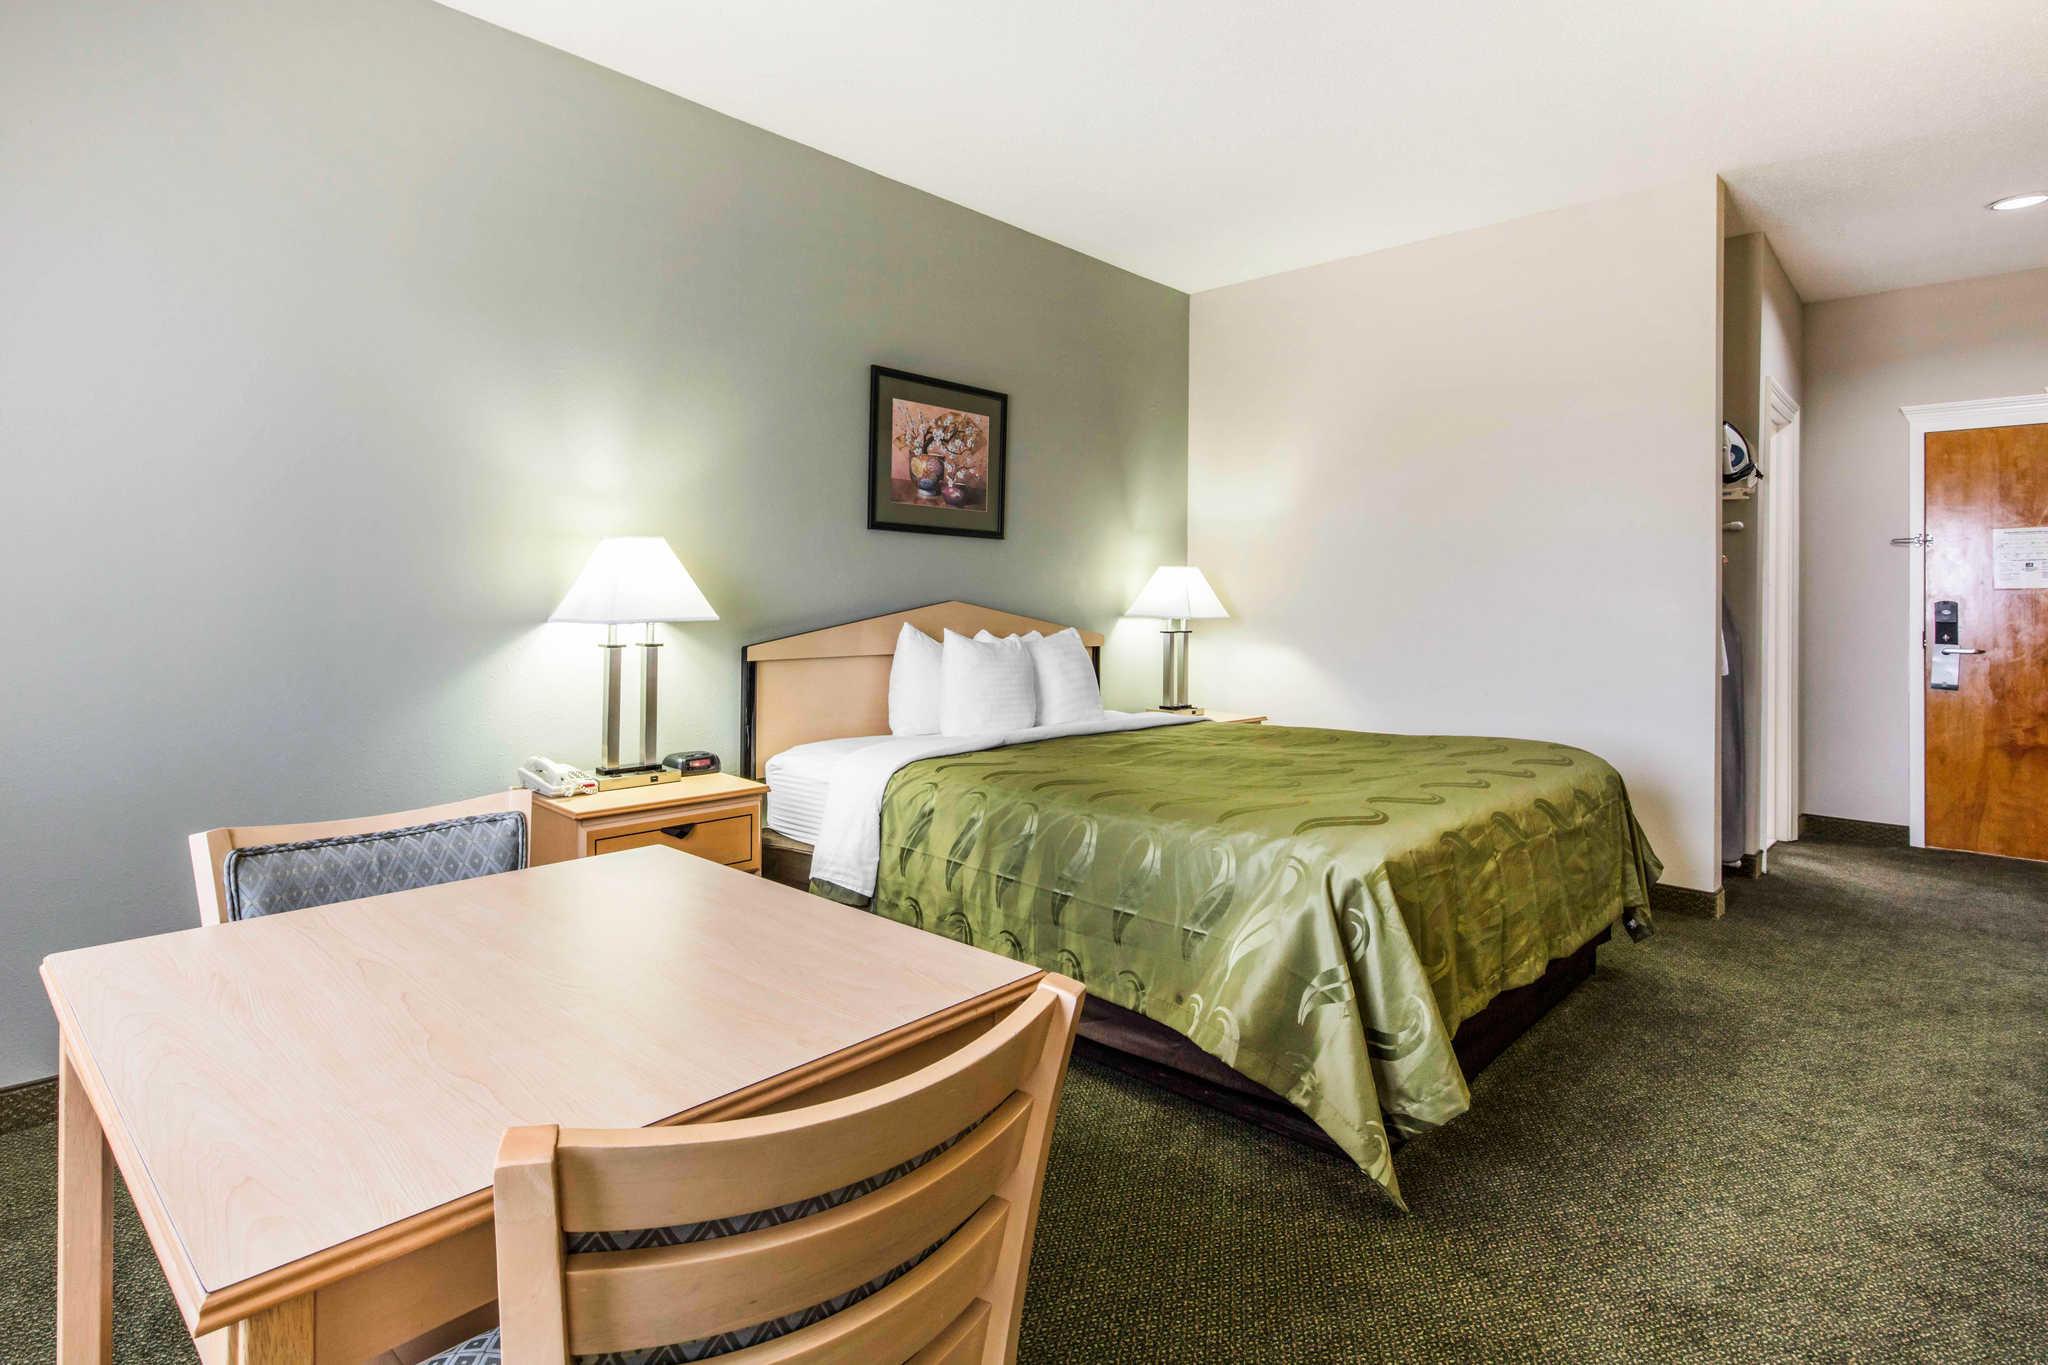 Quality Inn & Suites Jackson Int'l Airport image 12